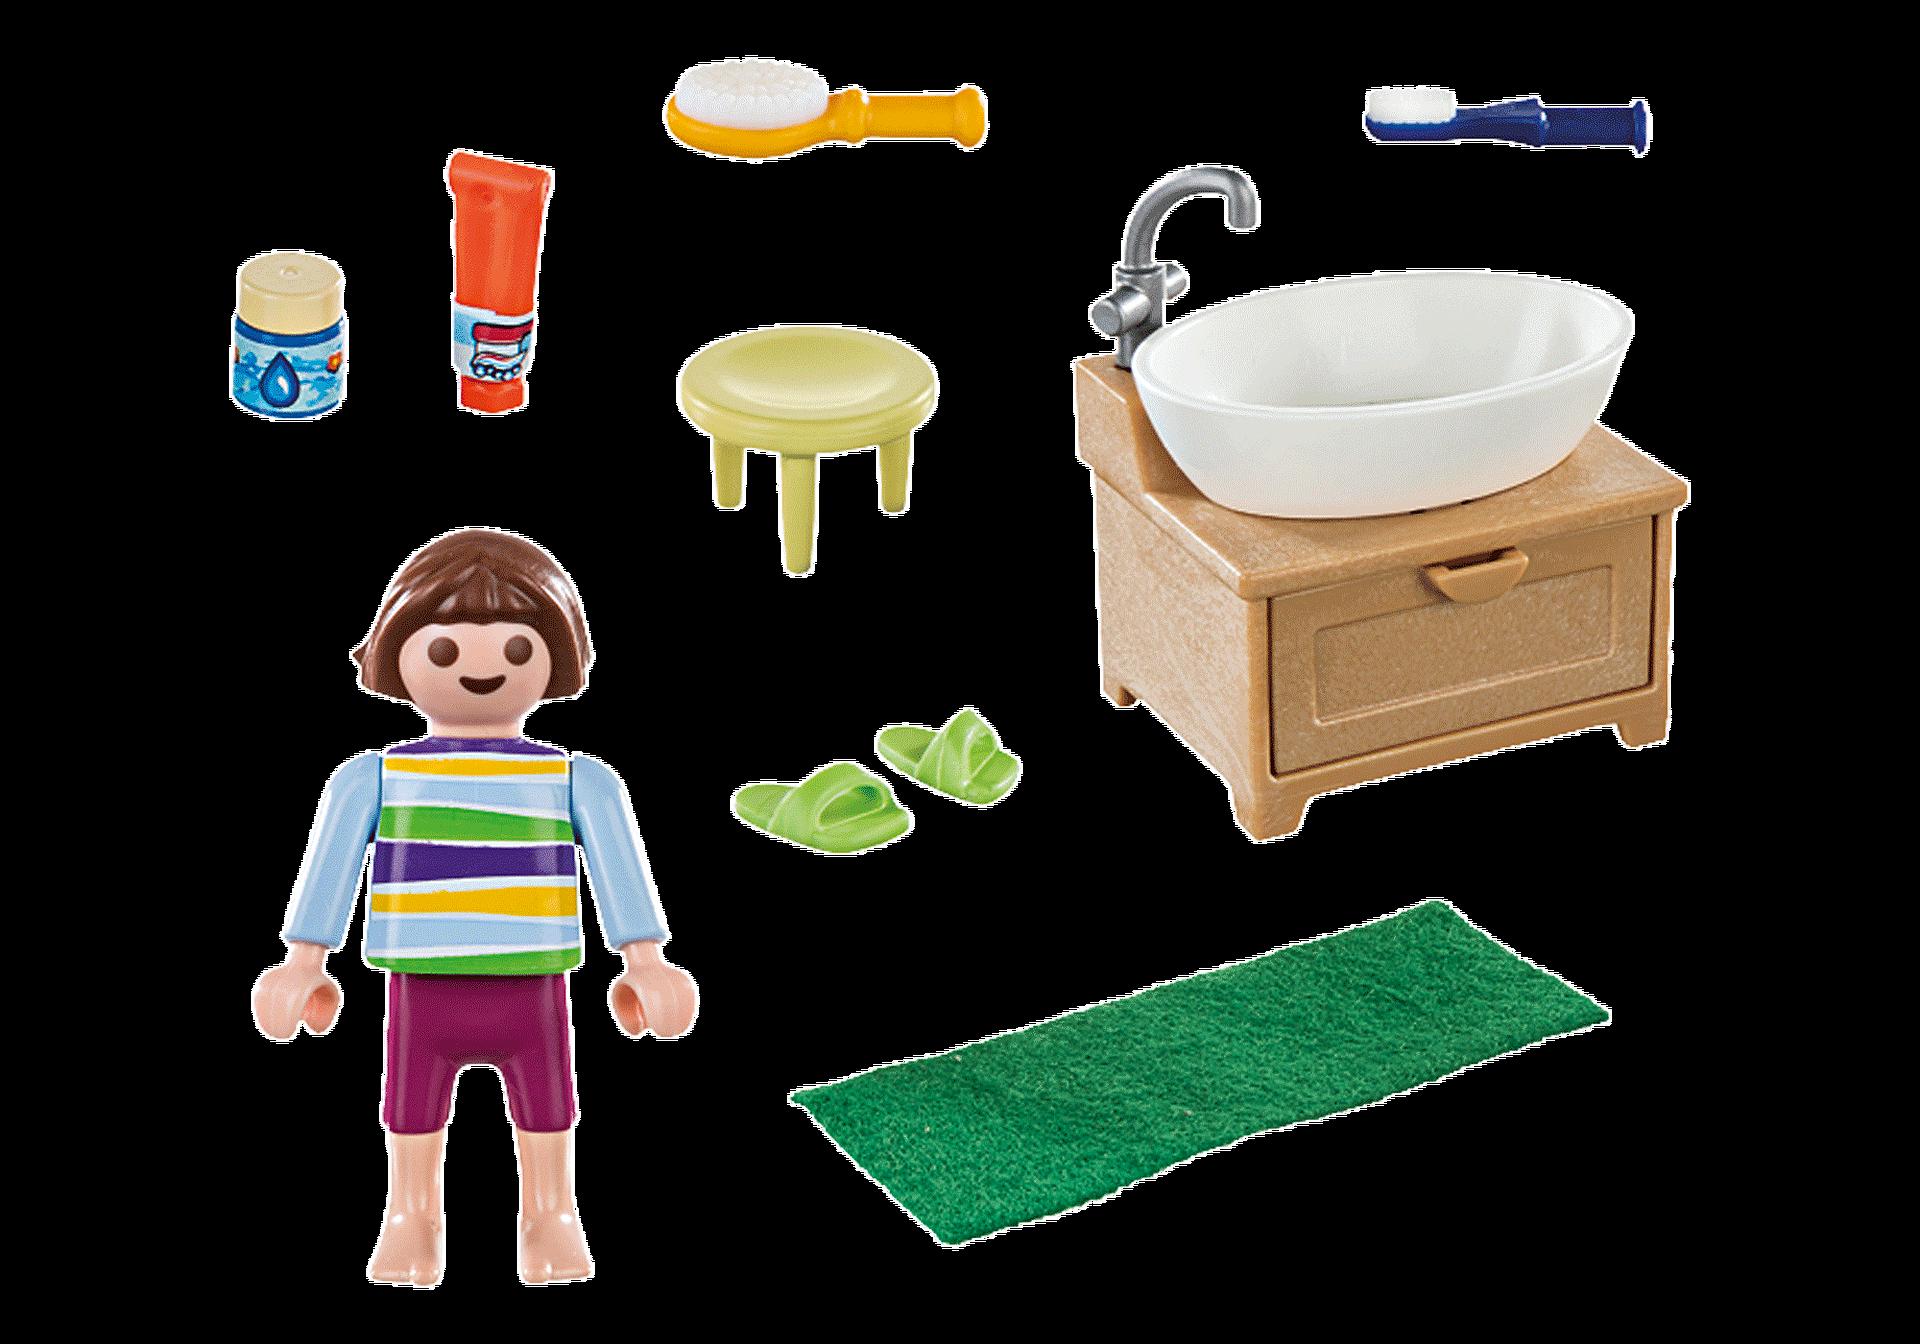 70301 Enfant avec lavabo  zoom image3